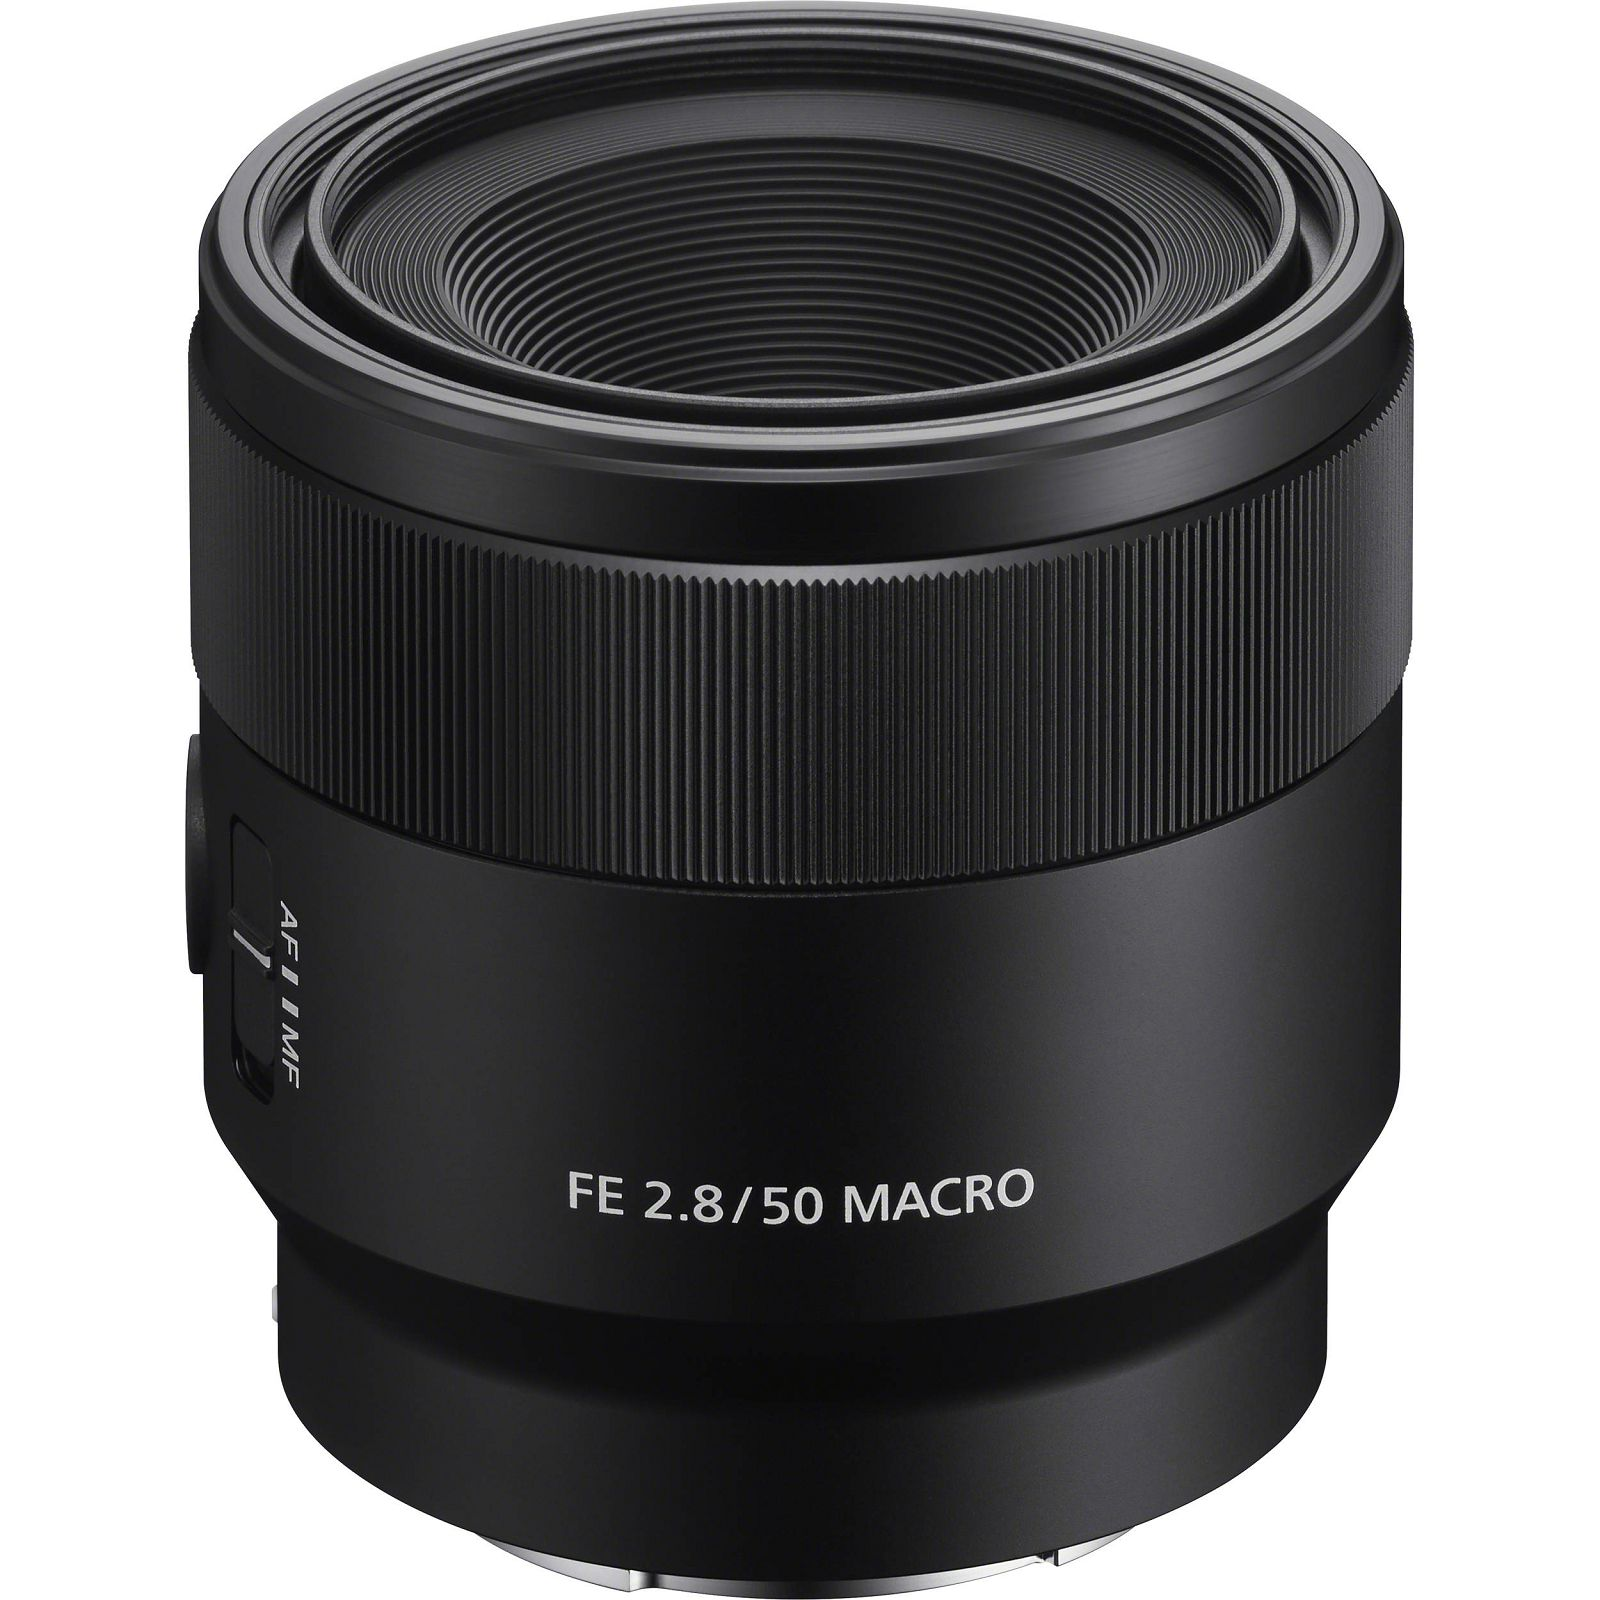 Sony FE 50mm f/2.8 Macro 1:1 standardni objektiv za E-Mount 50 F2.8 2.8 f/2,8 SEL-50M28 SEL50M28 (SEL50M28.SYX)